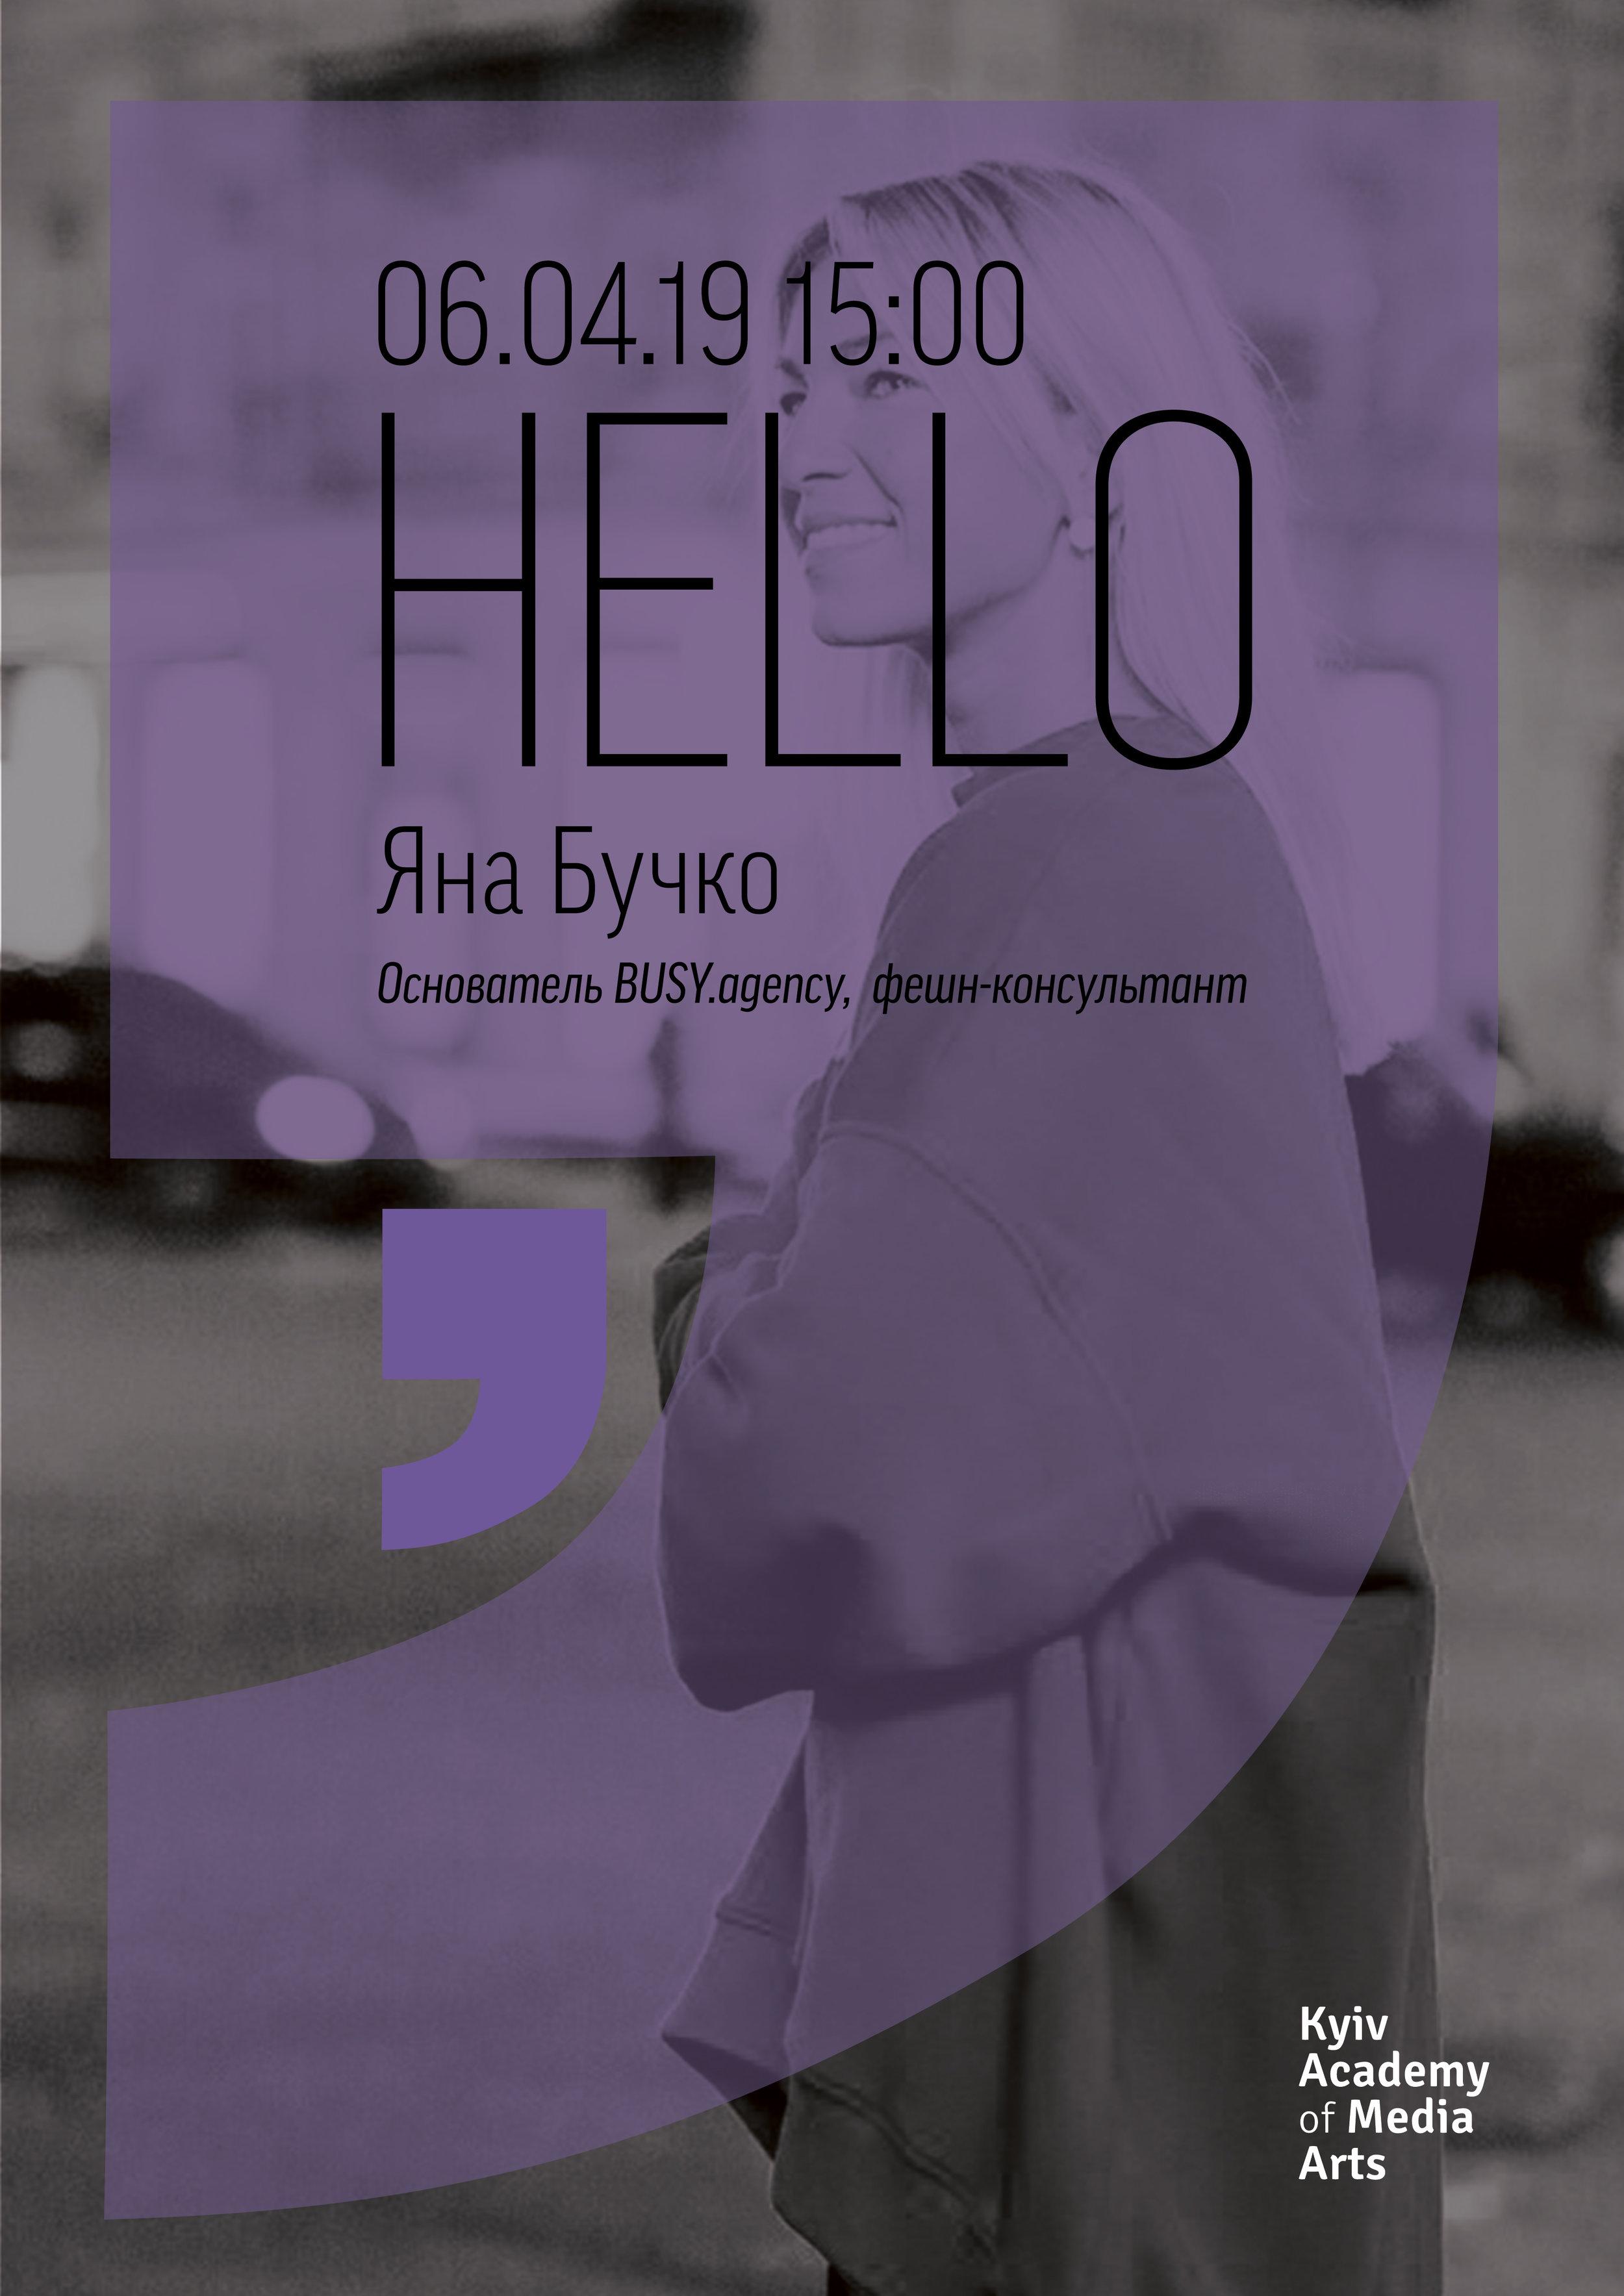 hero_buchko3.jpg